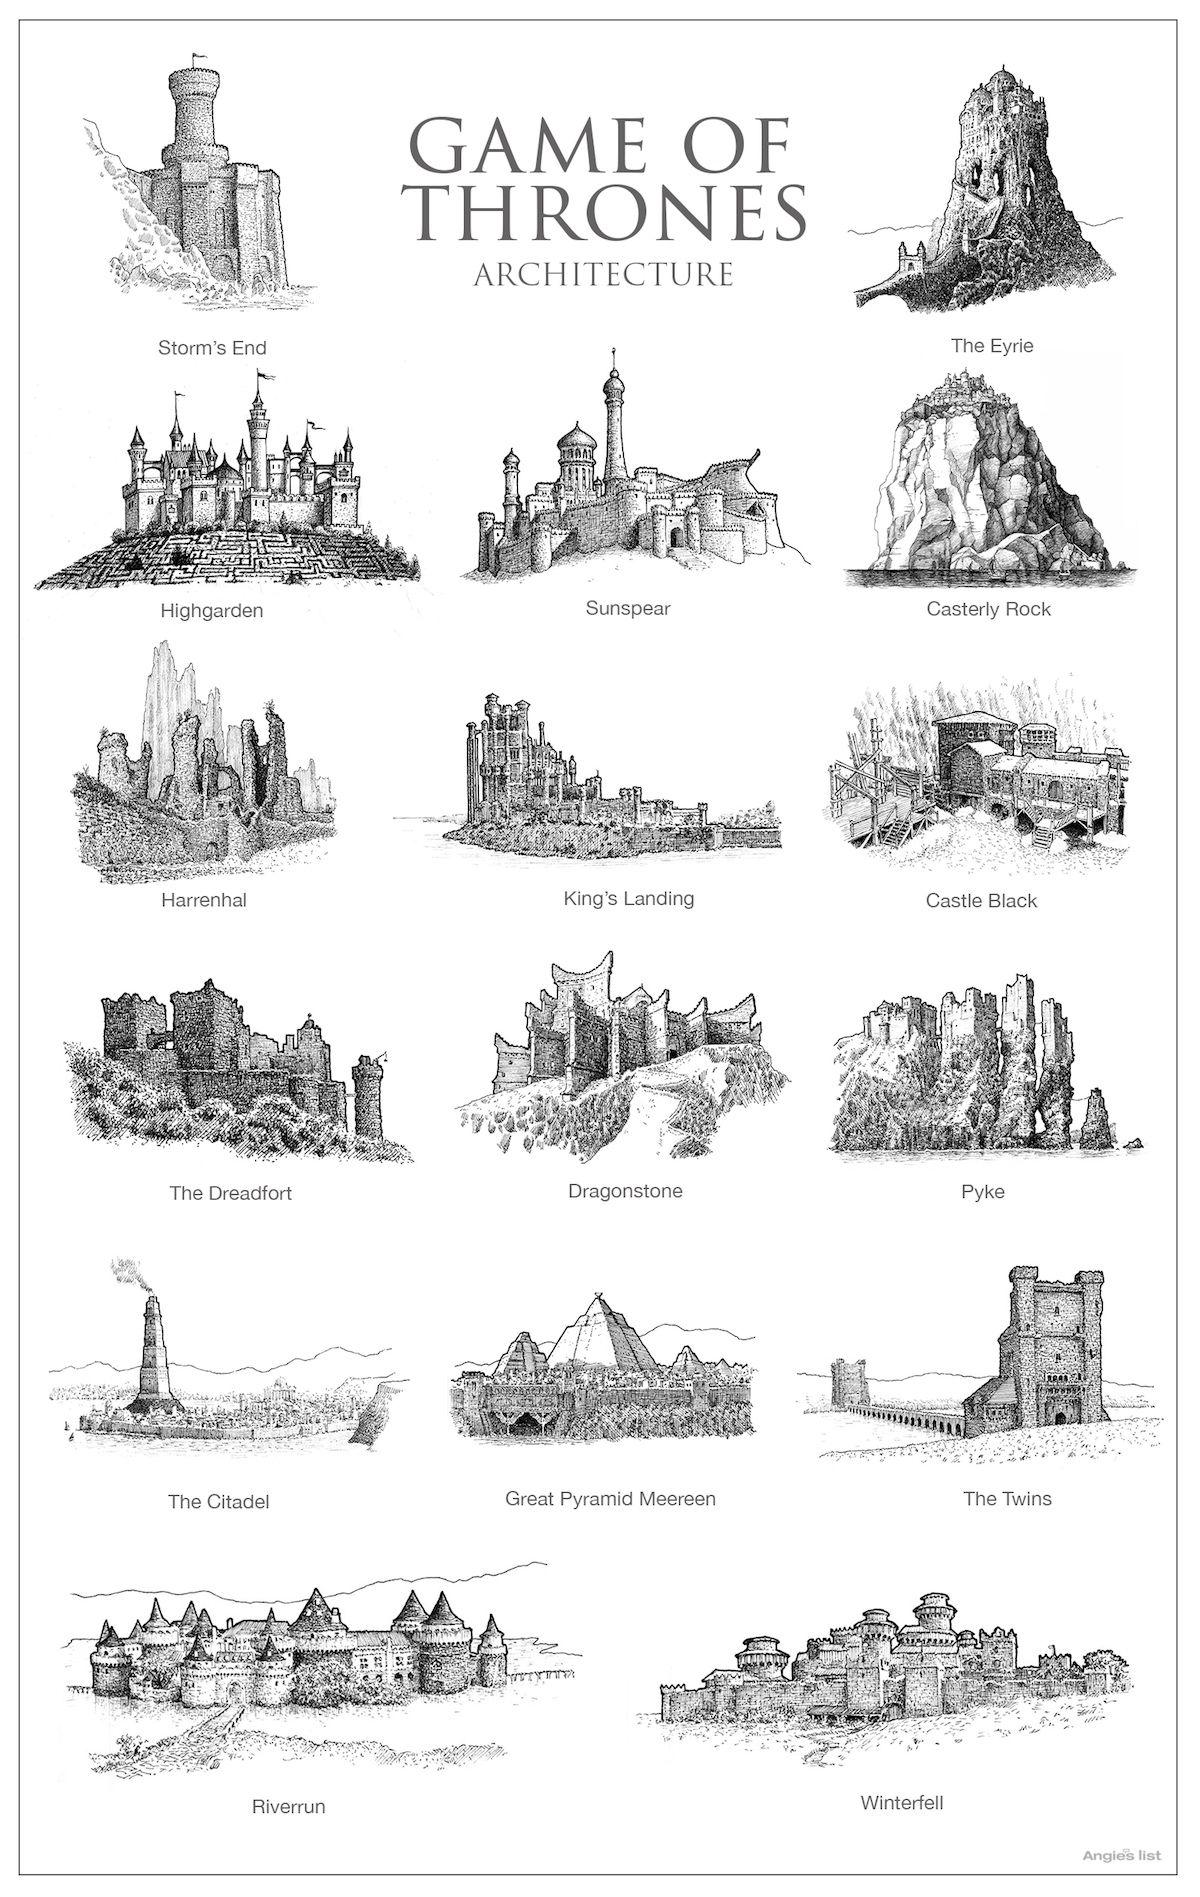 B&W Pen Drawings Celebrate Fantastic Architecture of Beloved Pop Culture Universes